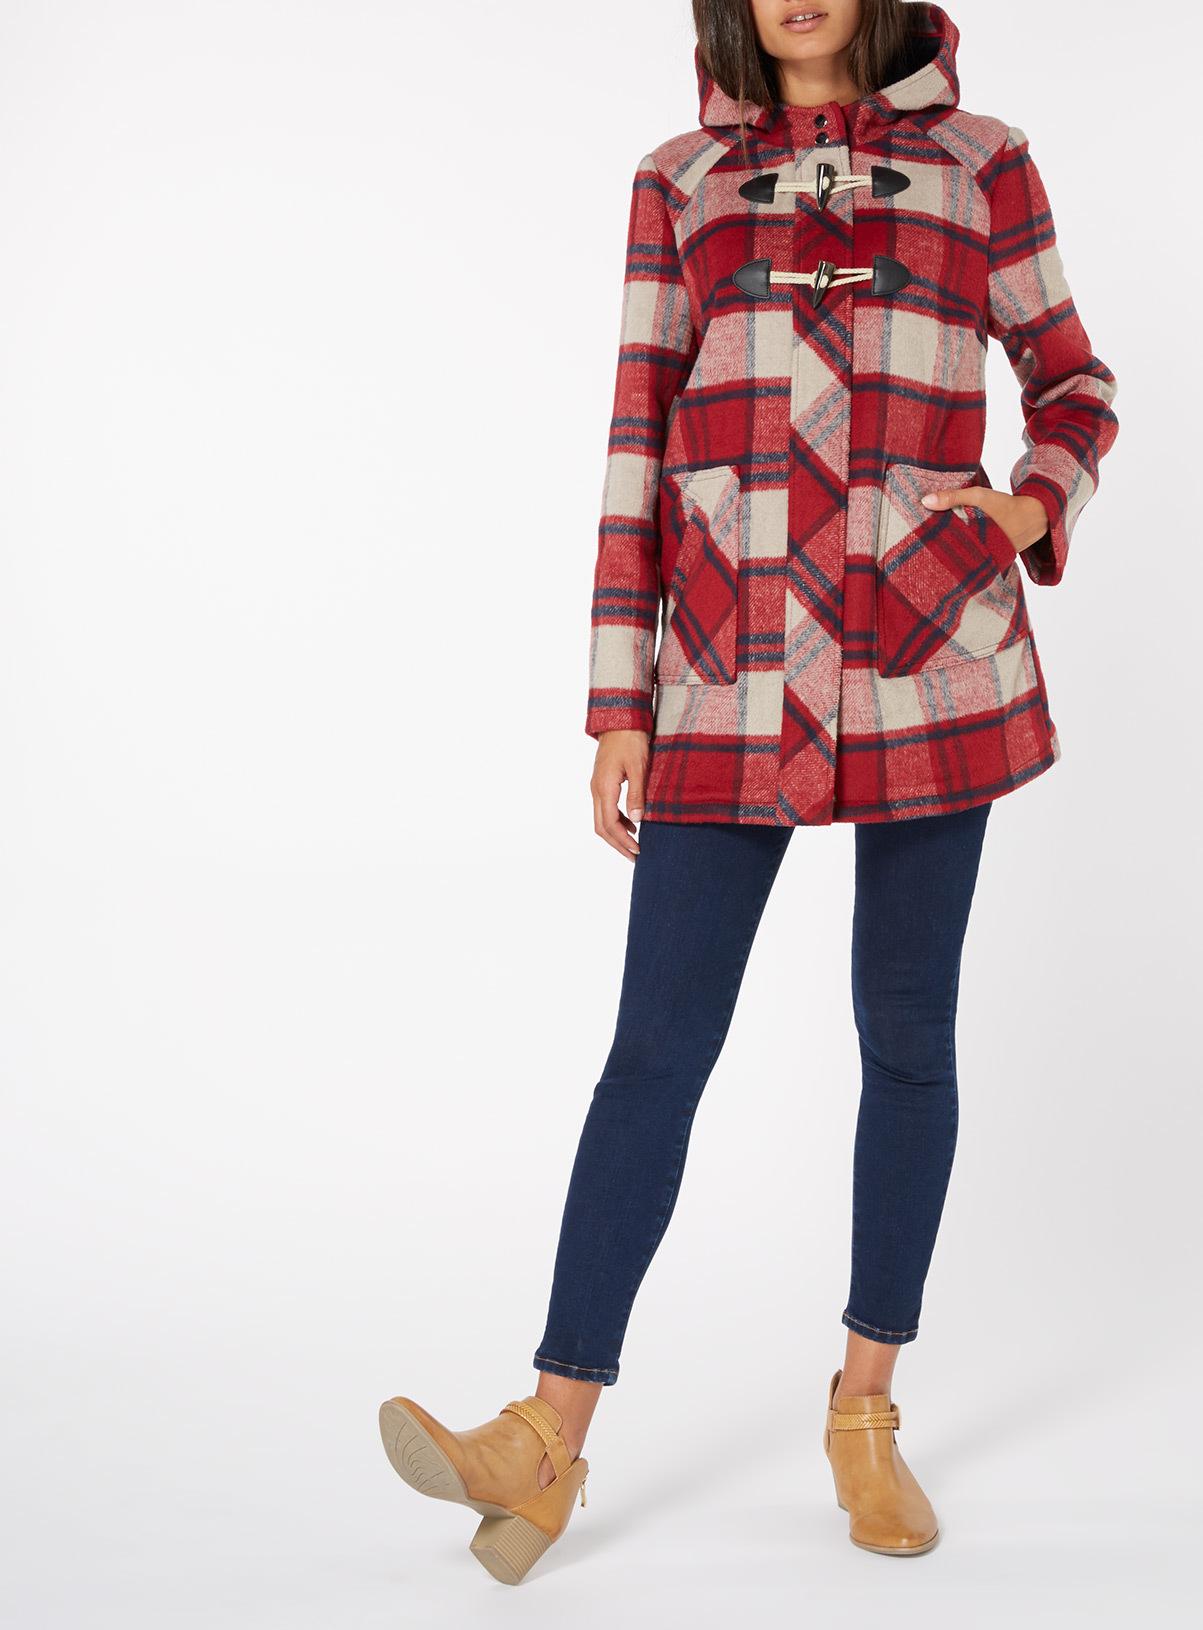 Womens Red Check Duffle Coat | Tu clothing